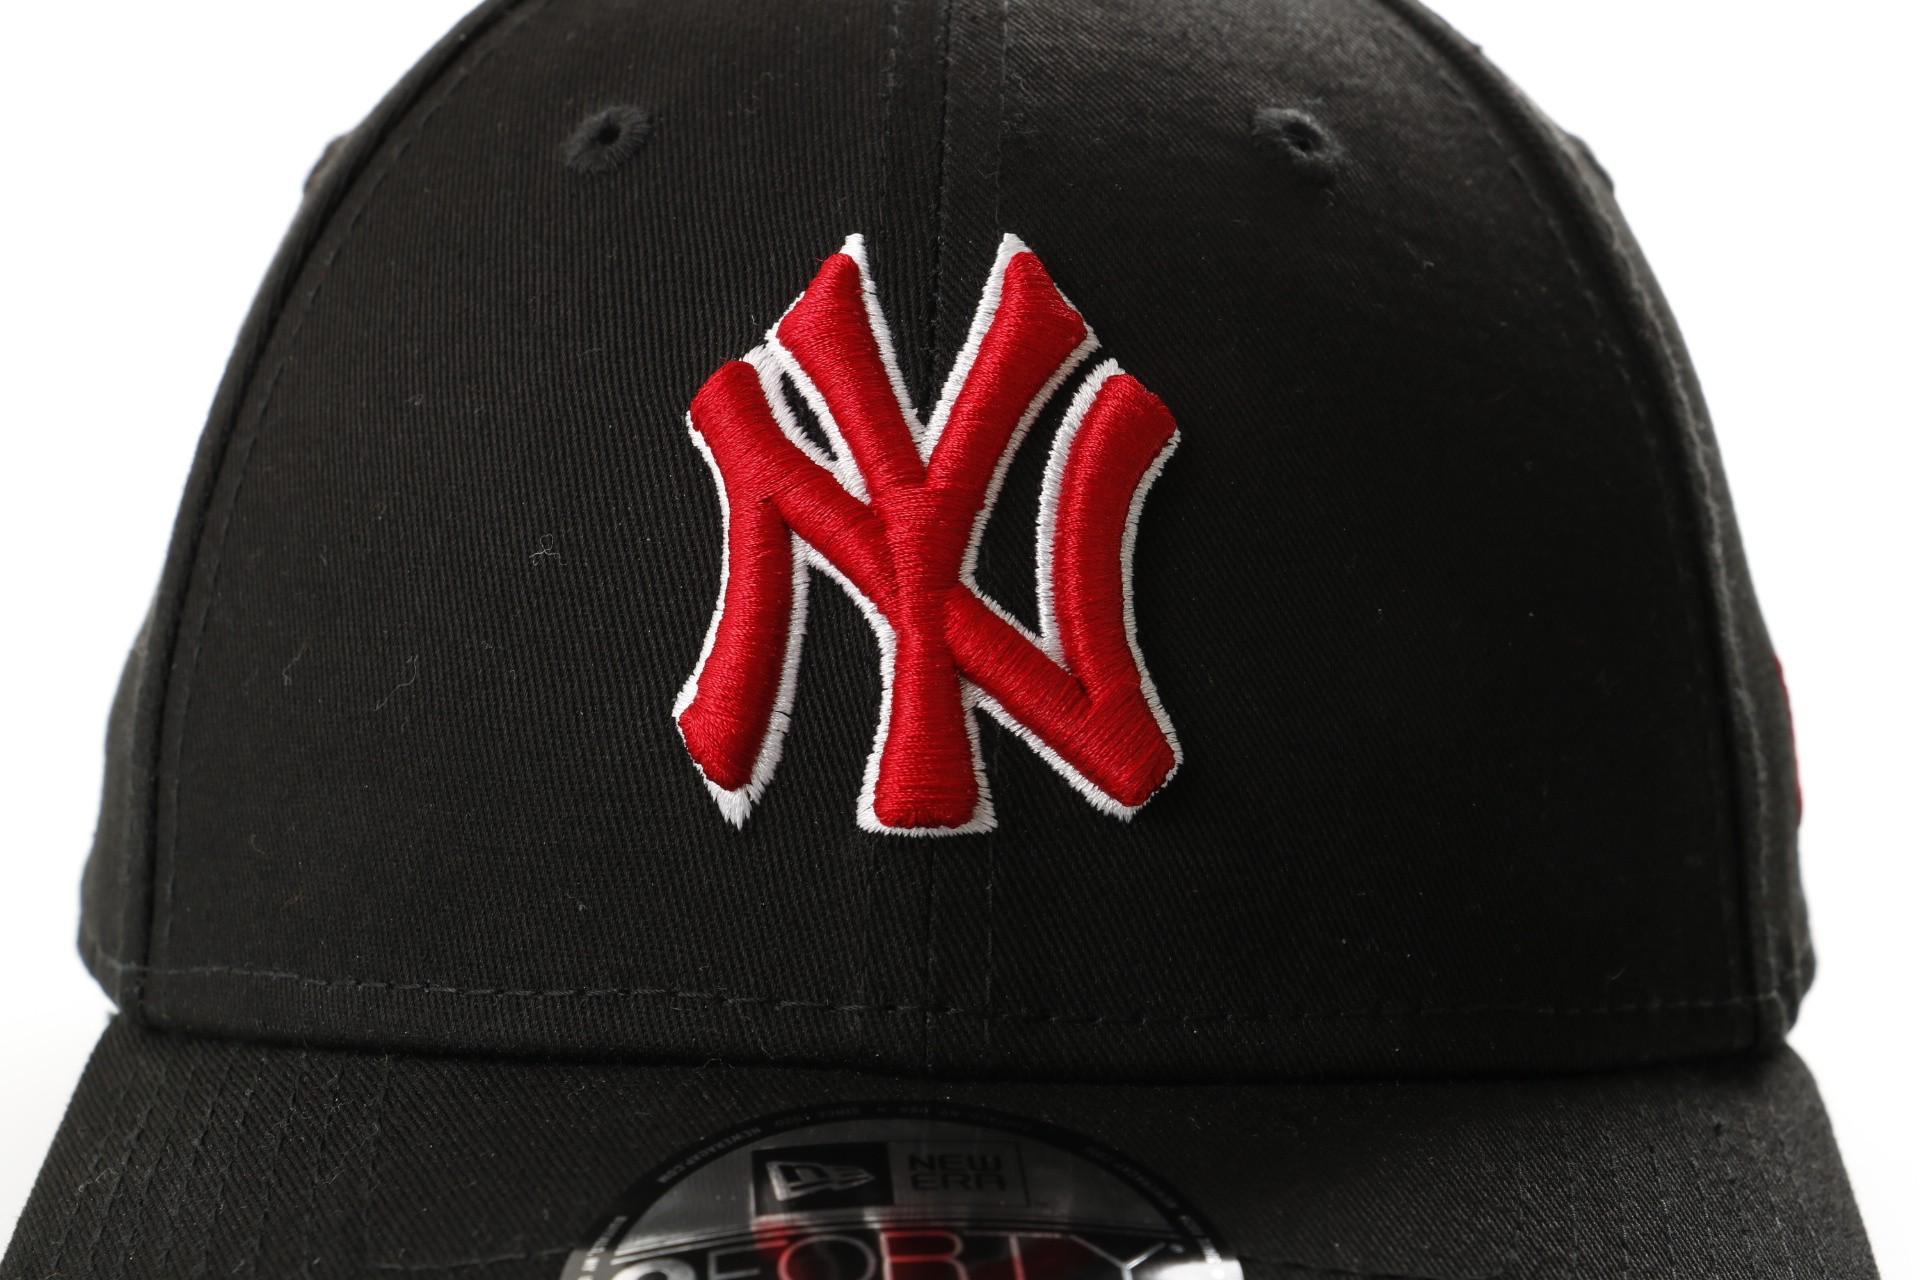 Afbeelding van New Era 9Forty Blksca New York Yankees 11841190 Dad Cap Black/Red White Outline Mlb